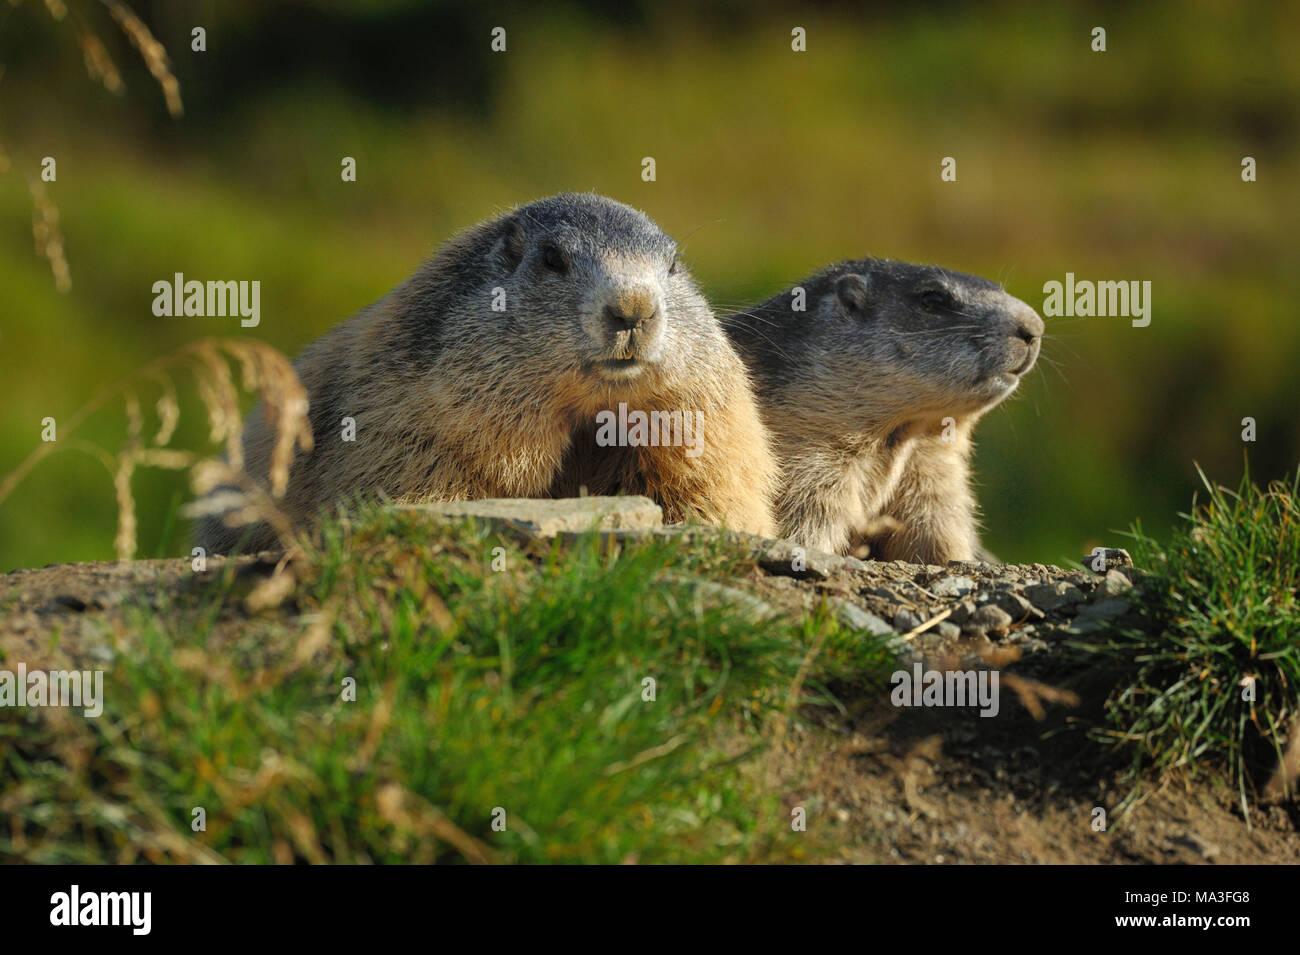 Alpine marmots on mountain pasture, Marmota marmota - Stock Image